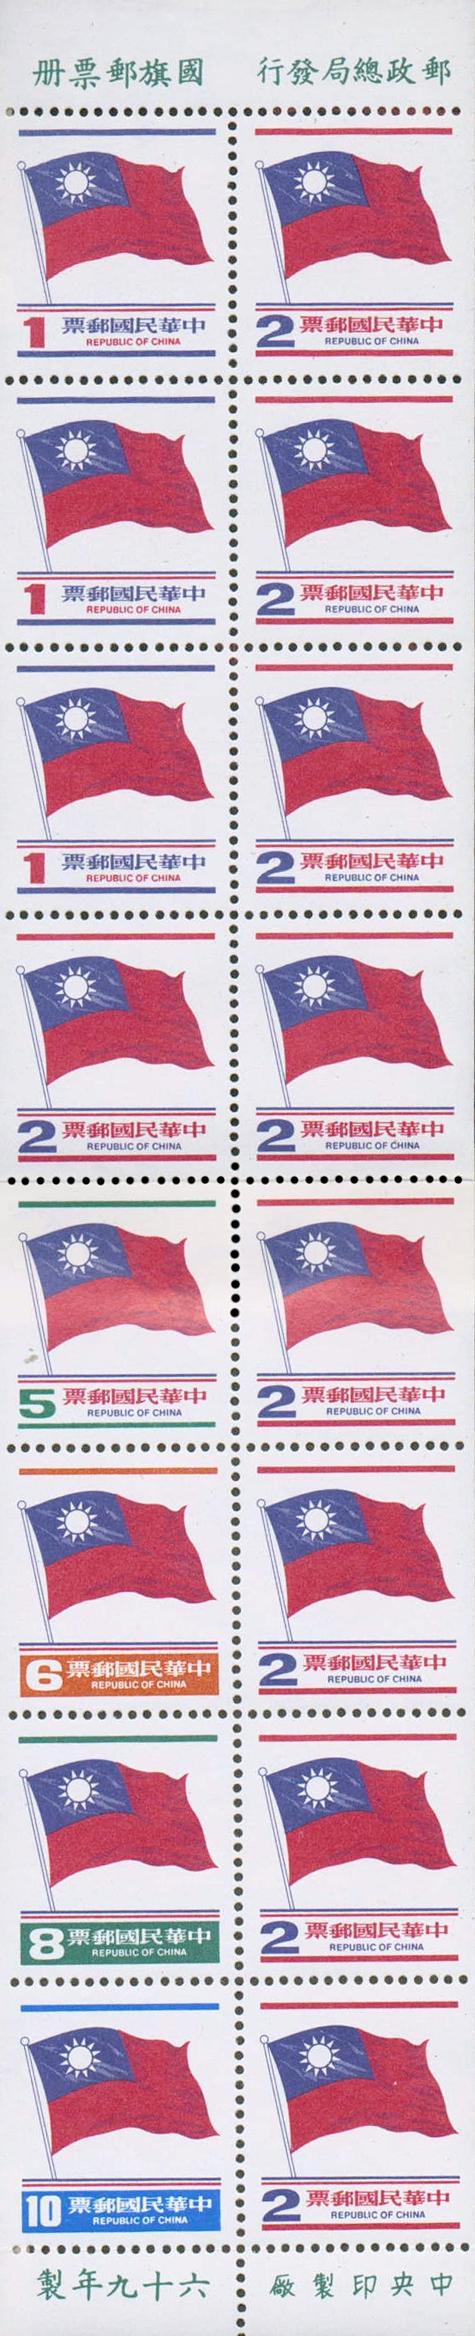 (常101.9)常101國旗郵票